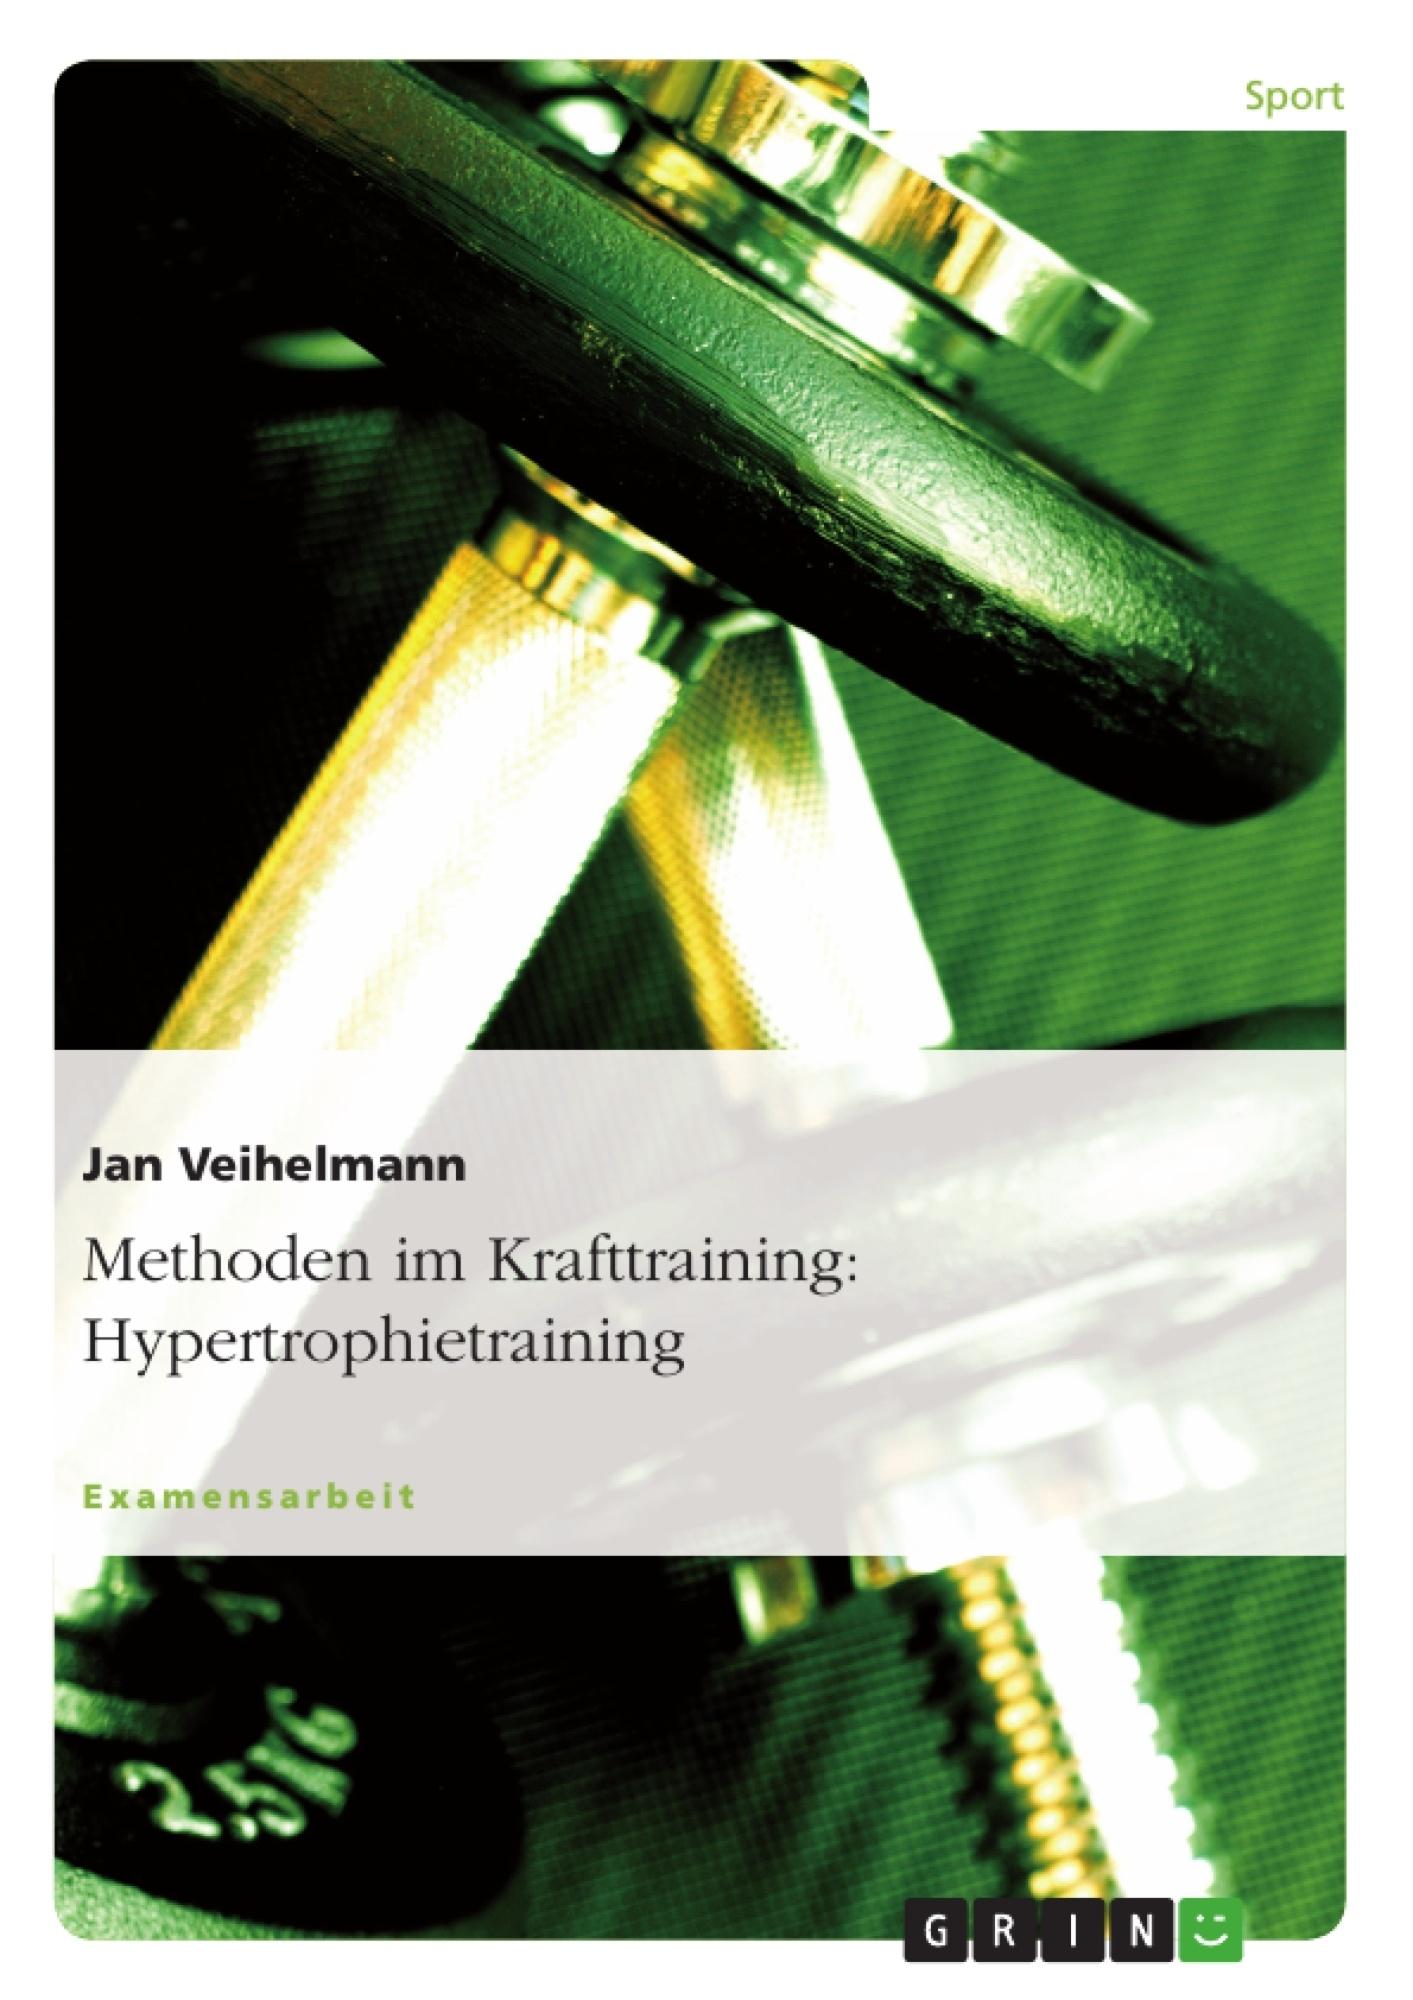 Titel: Methoden im Krafttraining: Hypertrophietraining